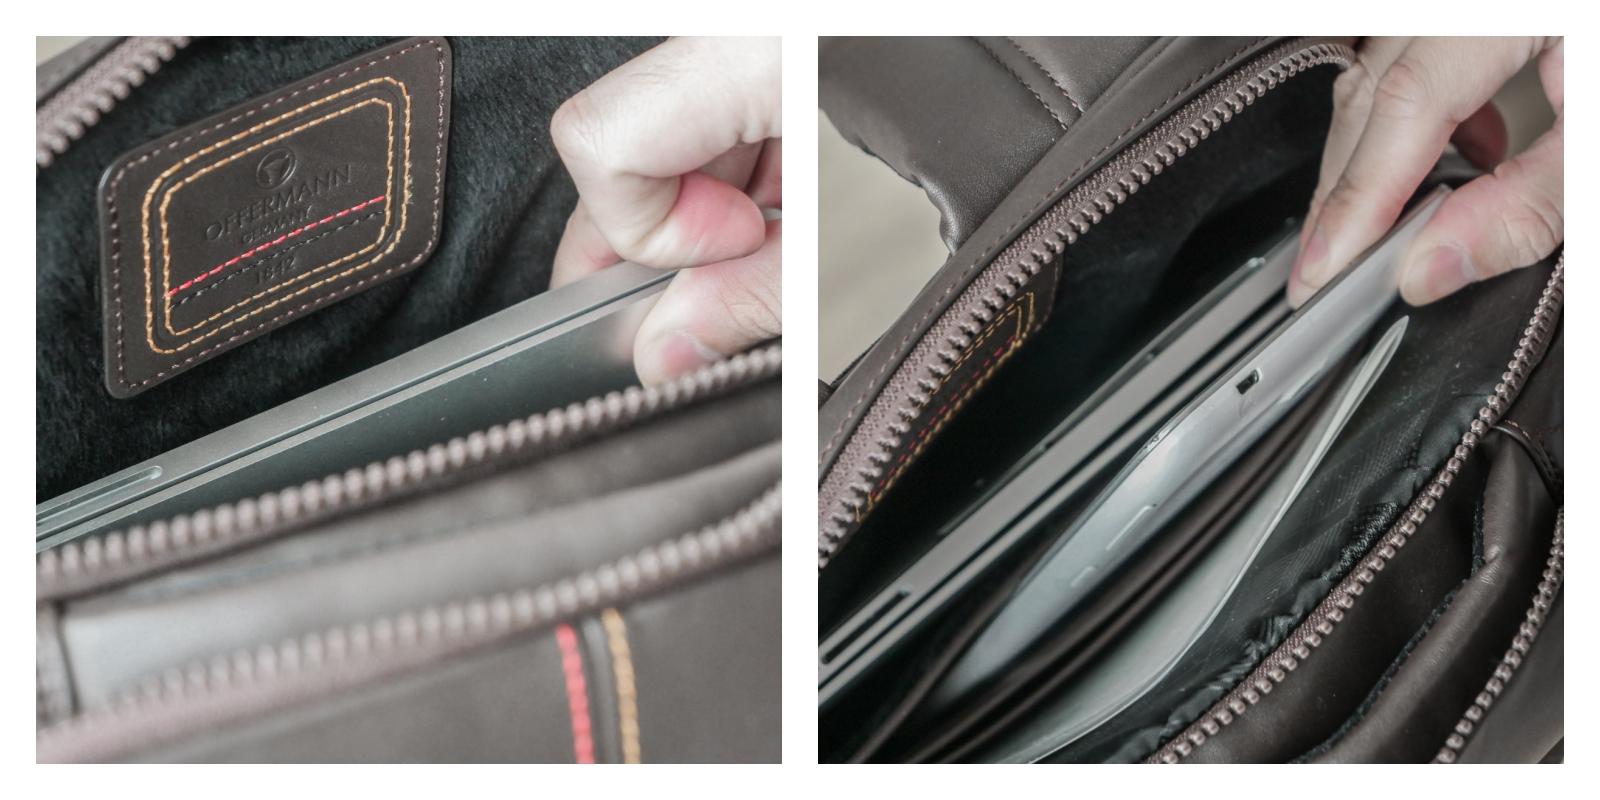 OFFERMANN 德國百年工藝頂級歐洲皮革 Force 商務休閒後背包